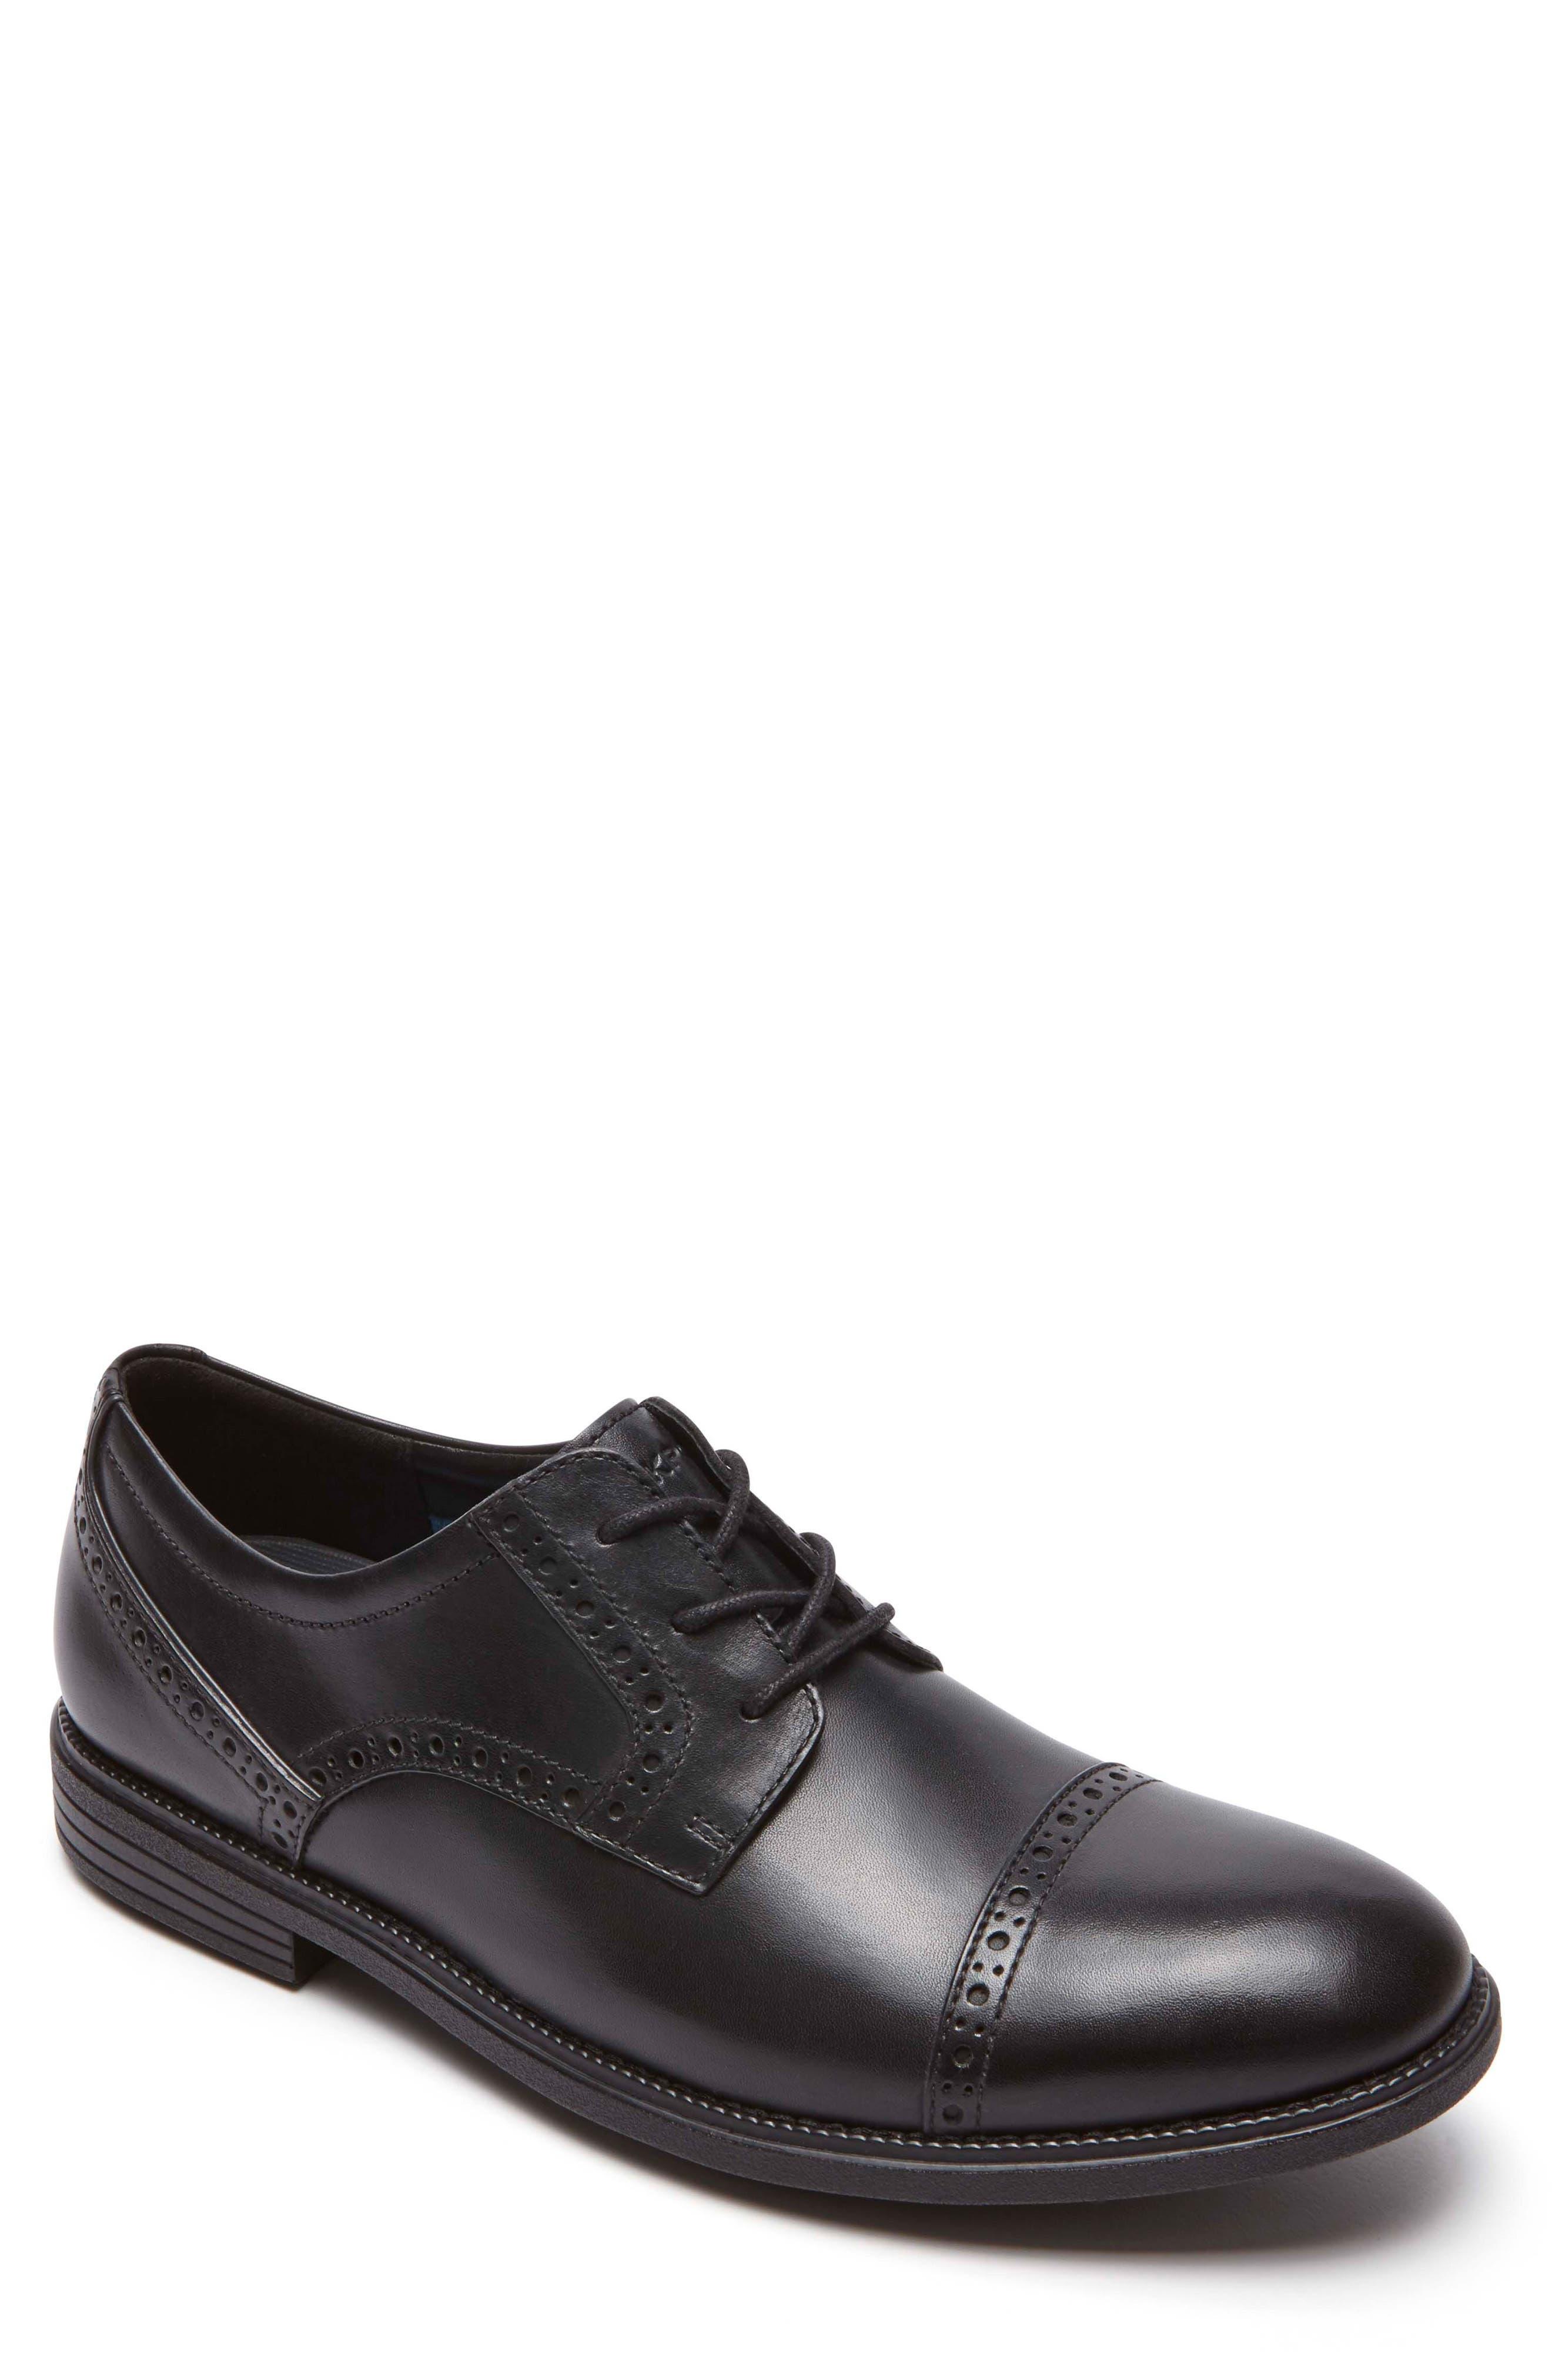 Madson Cap Toe Derby,                         Main,                         color, Black Leather